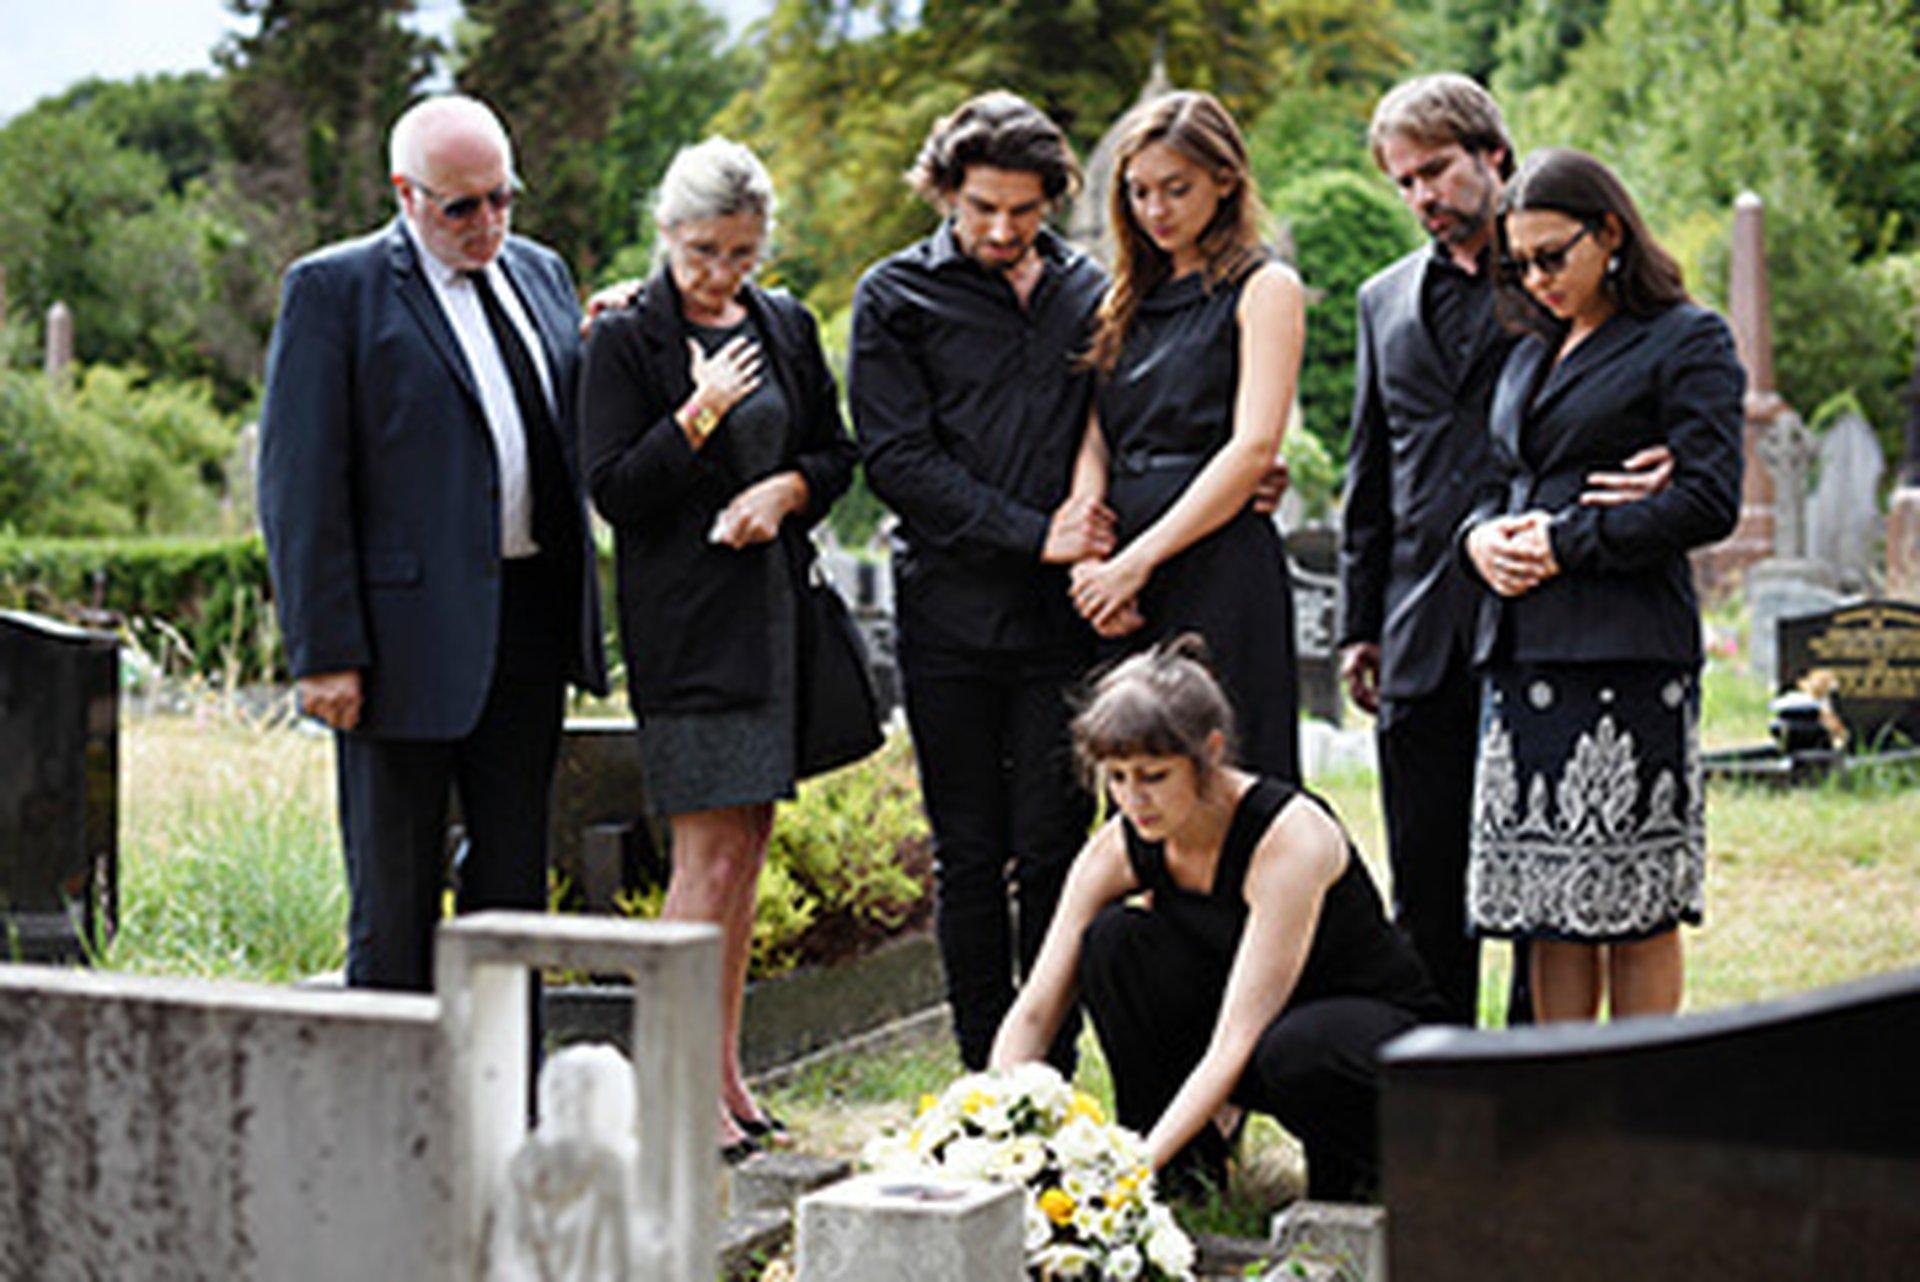 Erbengemeinschaft trauert am Grab: Haus geerbt